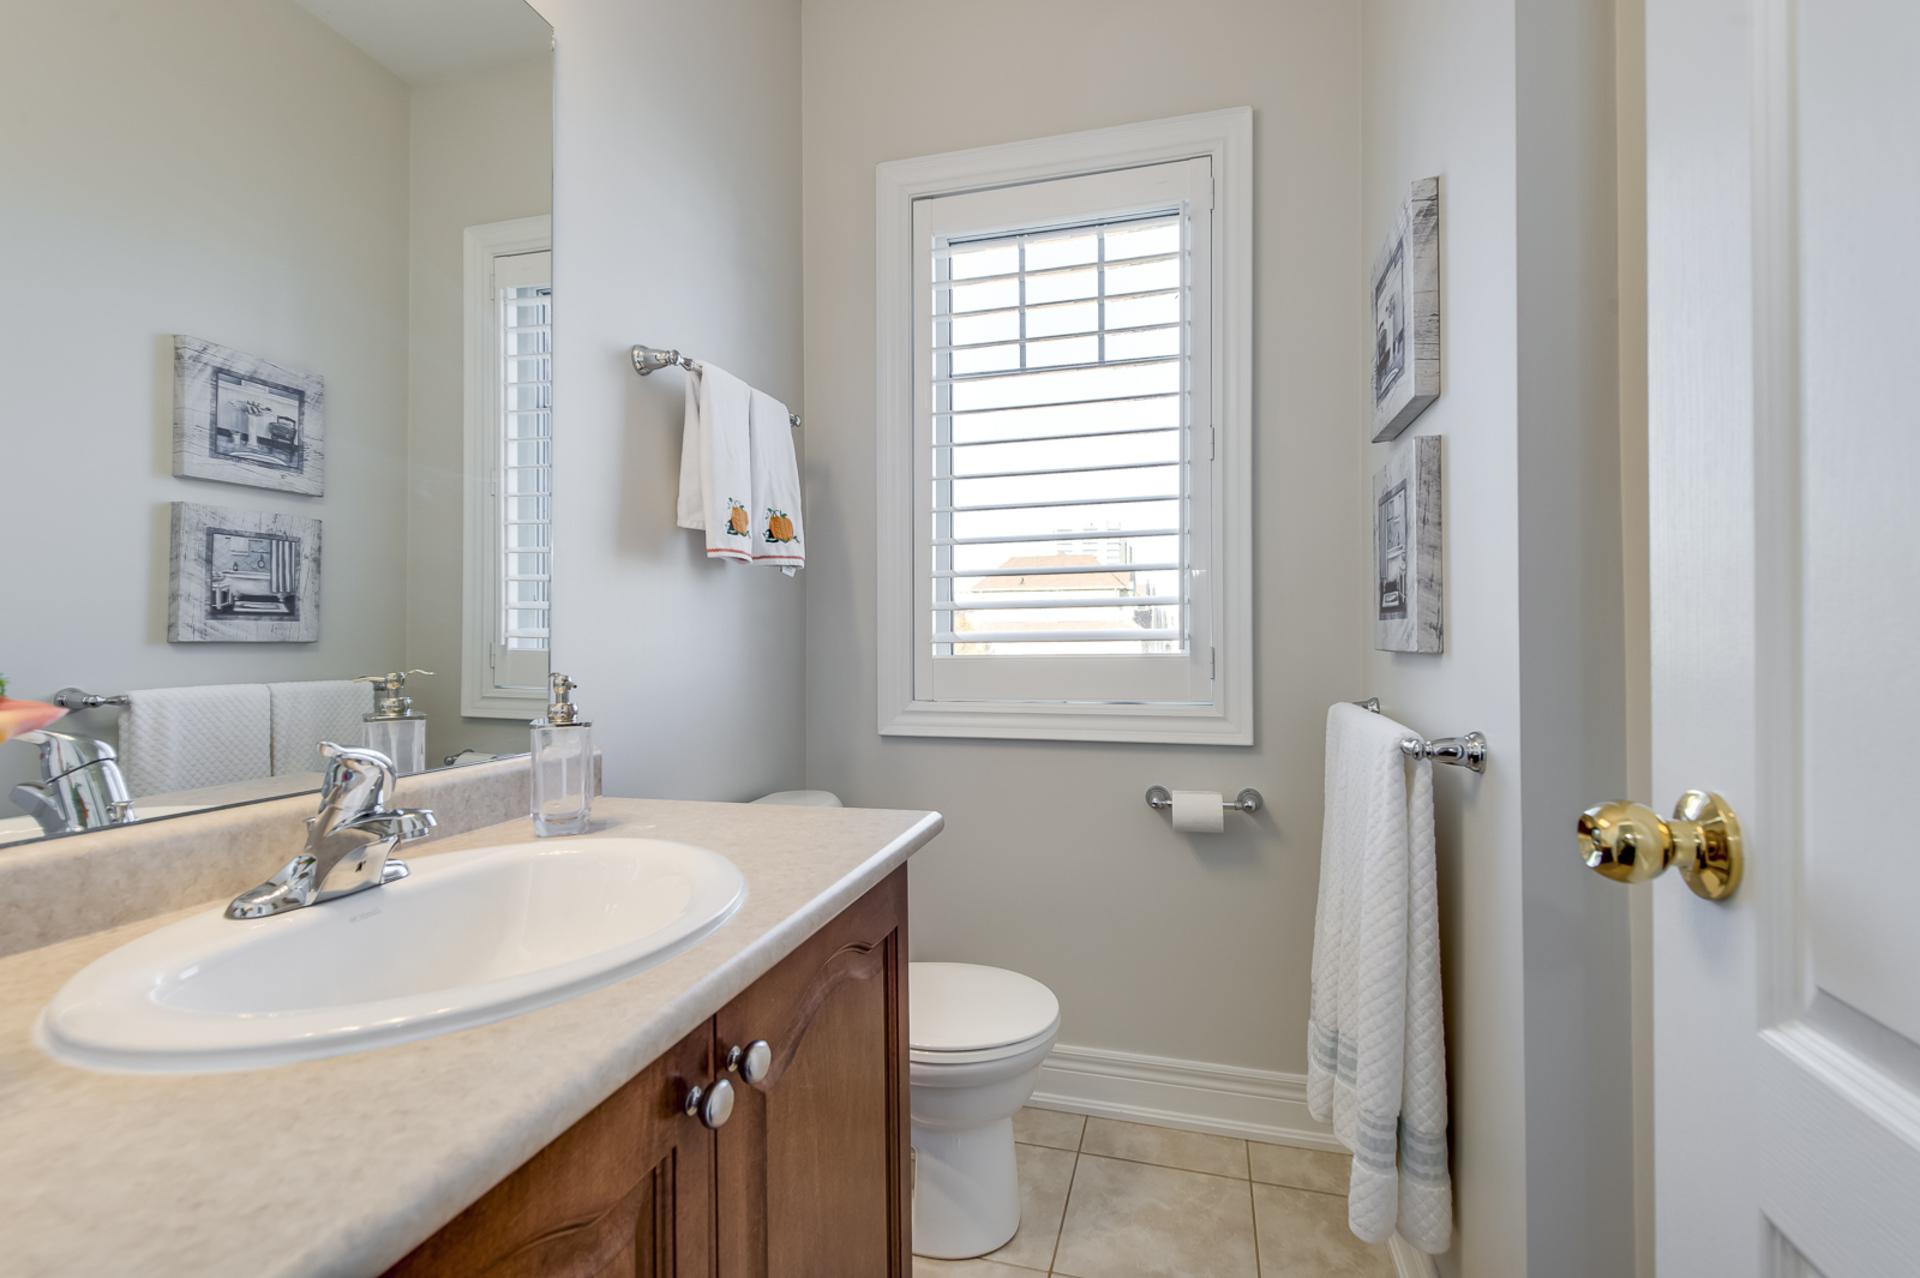 Main Bathroom - 2014 Lushes Ave, Mississauga - Elite3 & Team at 2014 Lushes Avenue, Clarkson, Mississauga